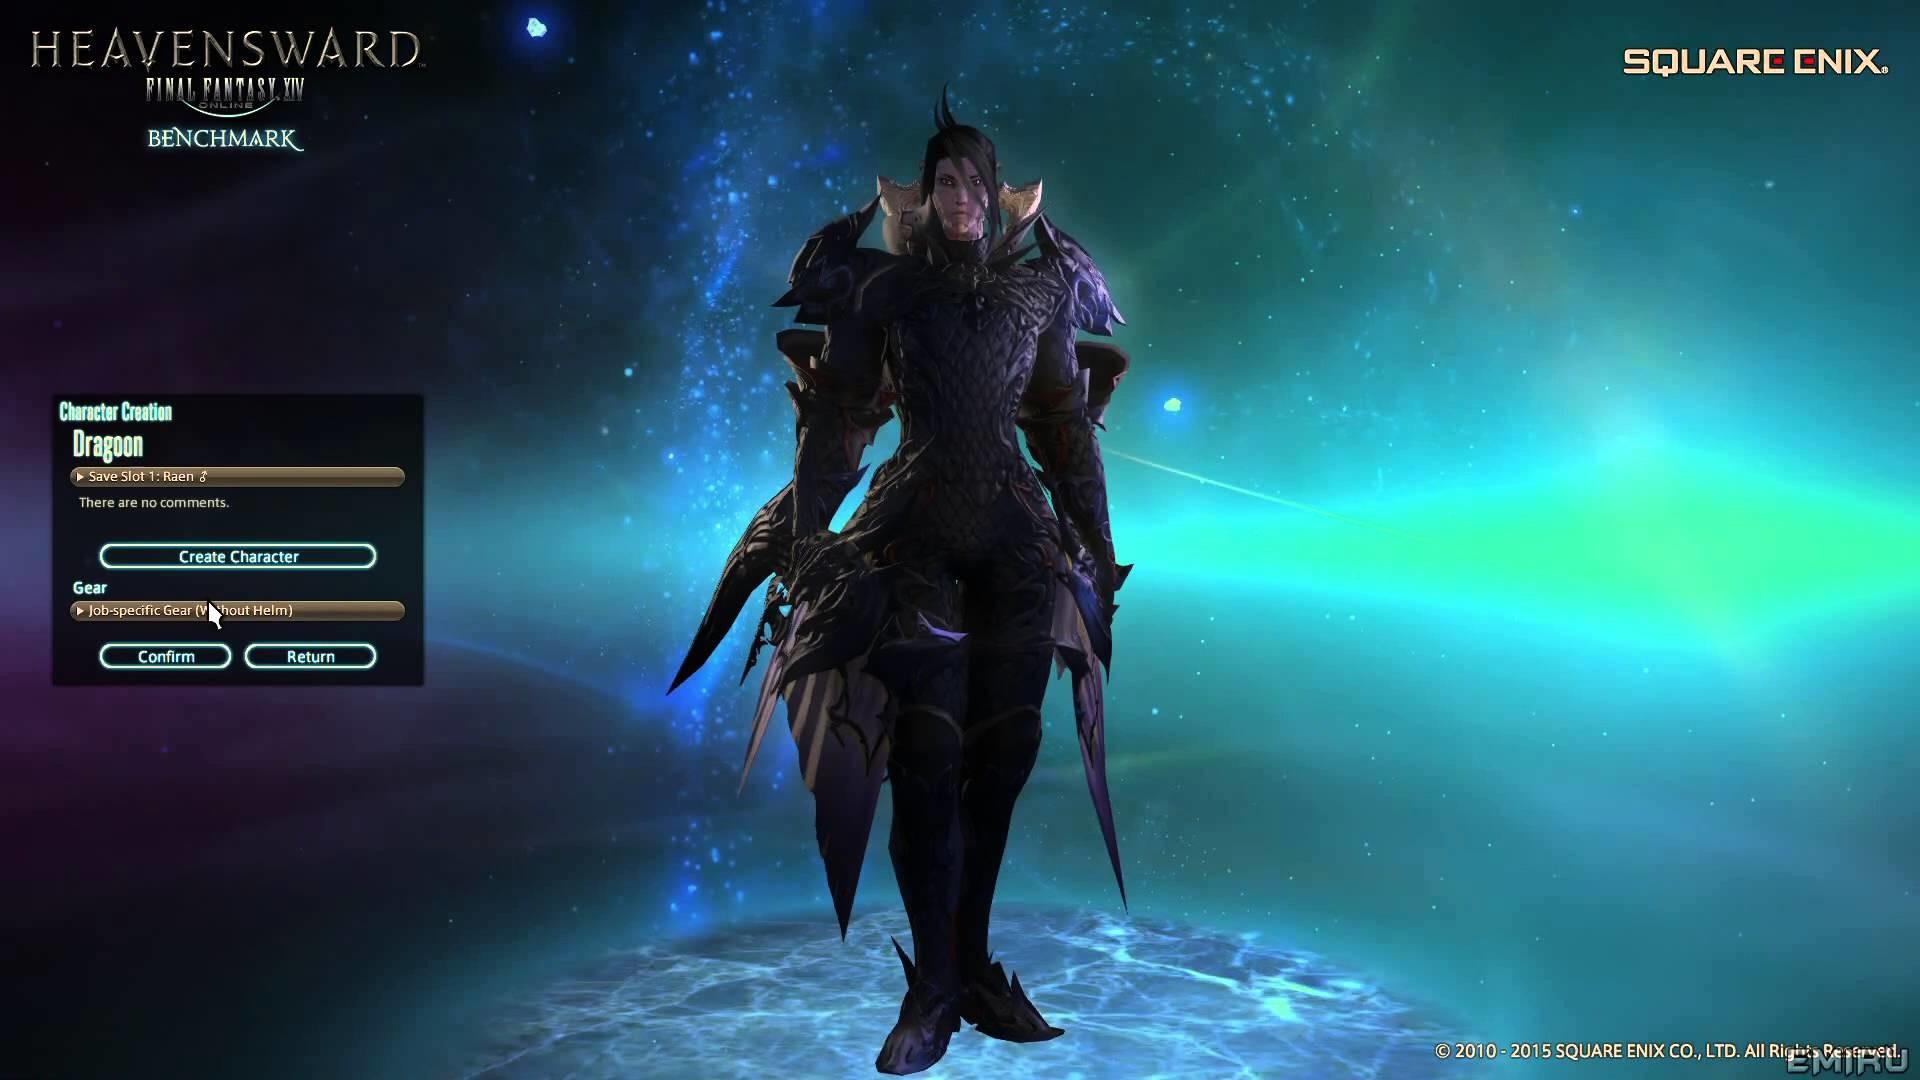 Final Fantasy XIV Heavensward Benchmark & Au Ra Character Creation – YouTube